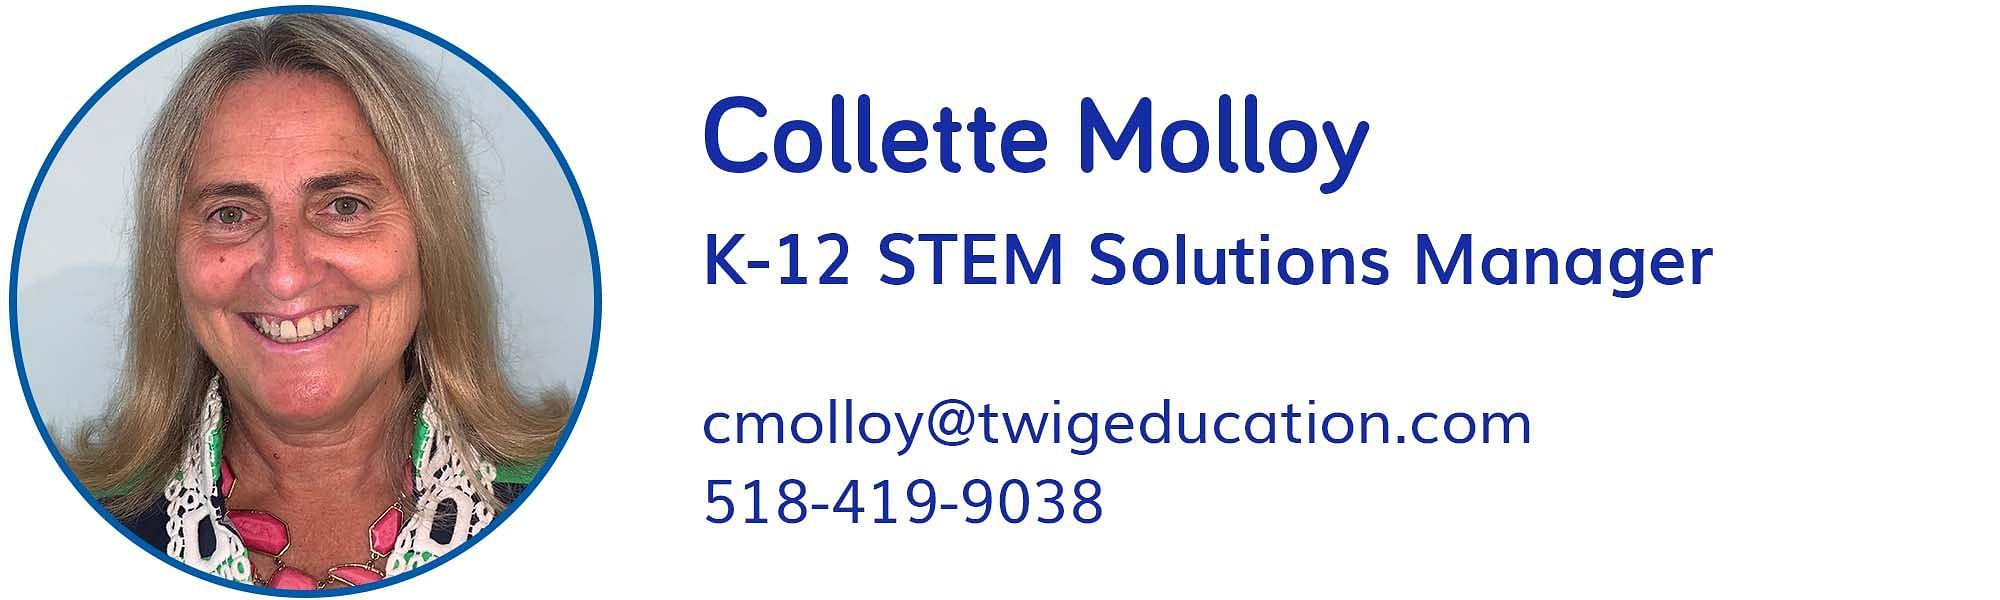 Collette Molloy, cmolloy@twigeducation.com, 518-419-9038